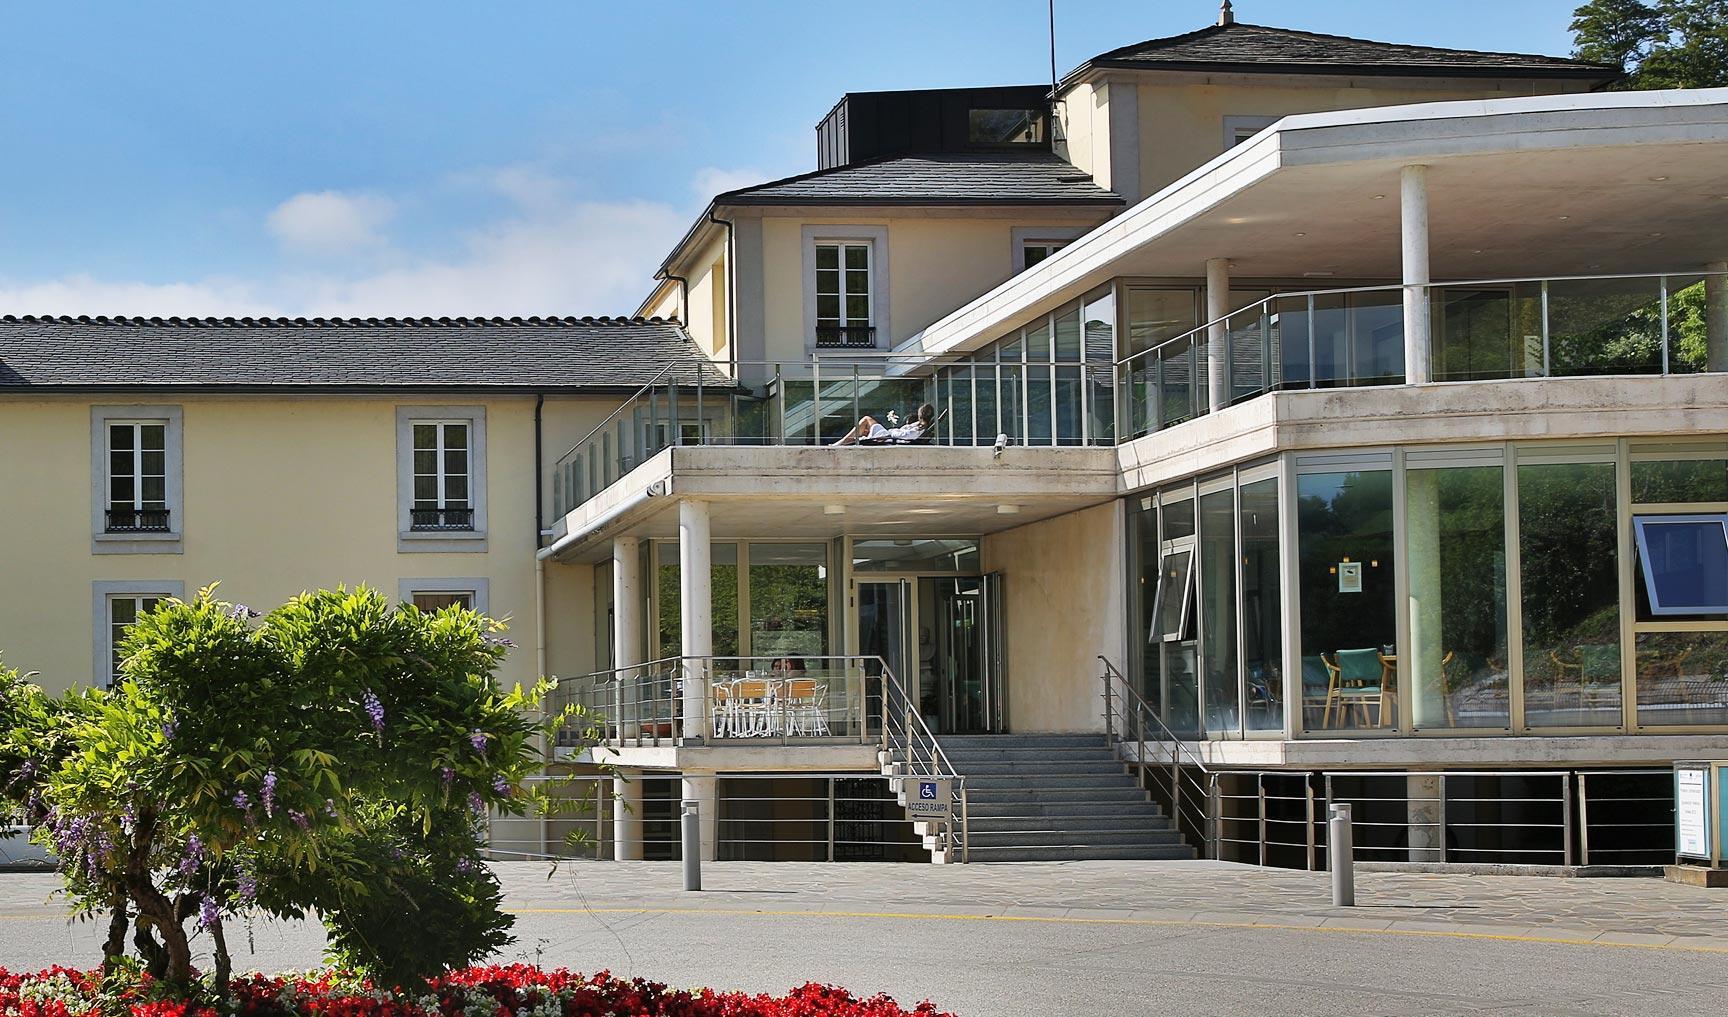 Balneario De Lugo - Hotel Termas Romanas